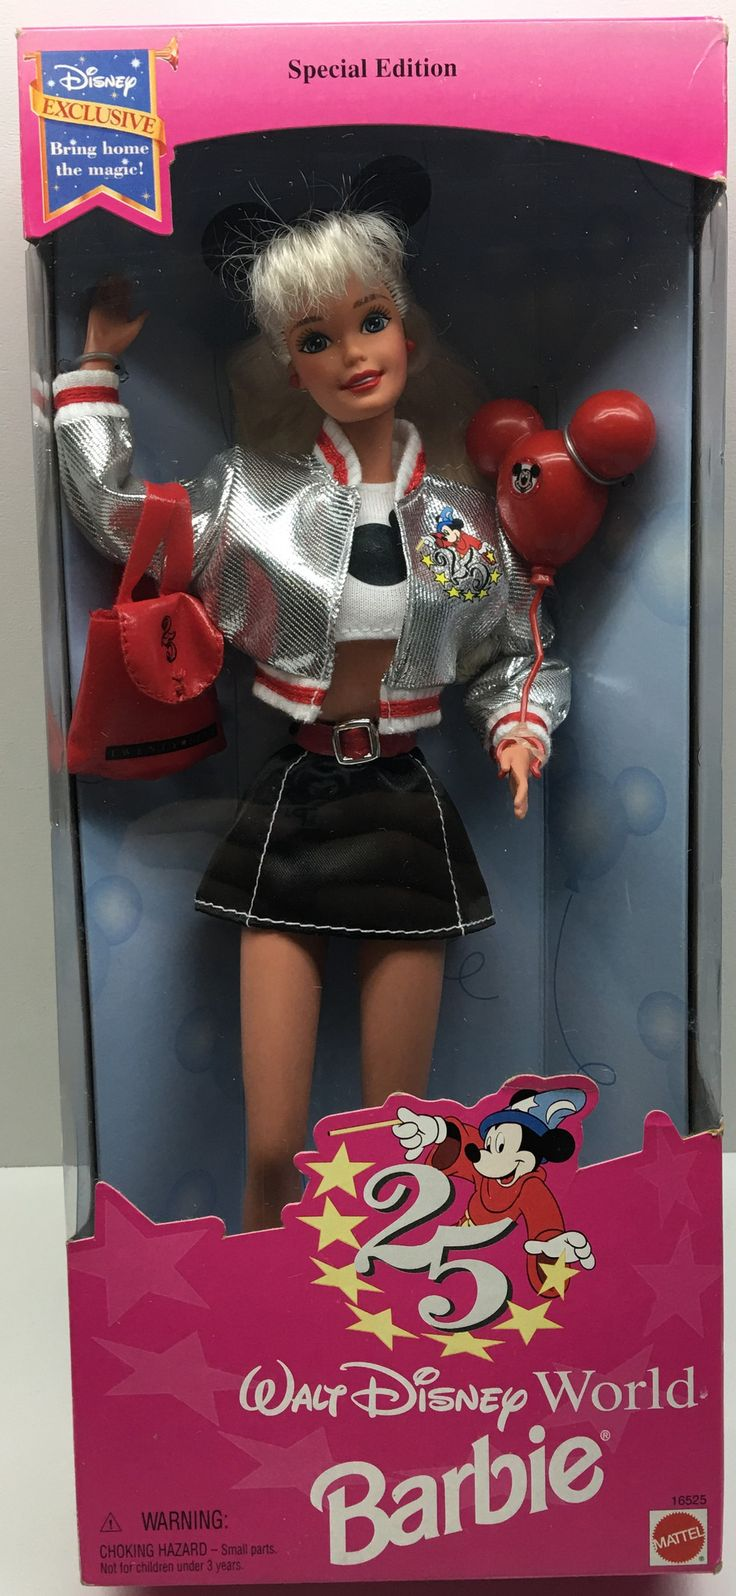 (TAS033330) - 1994 Mattel 25th Anniversary Special Edition Walt Disney Barbie